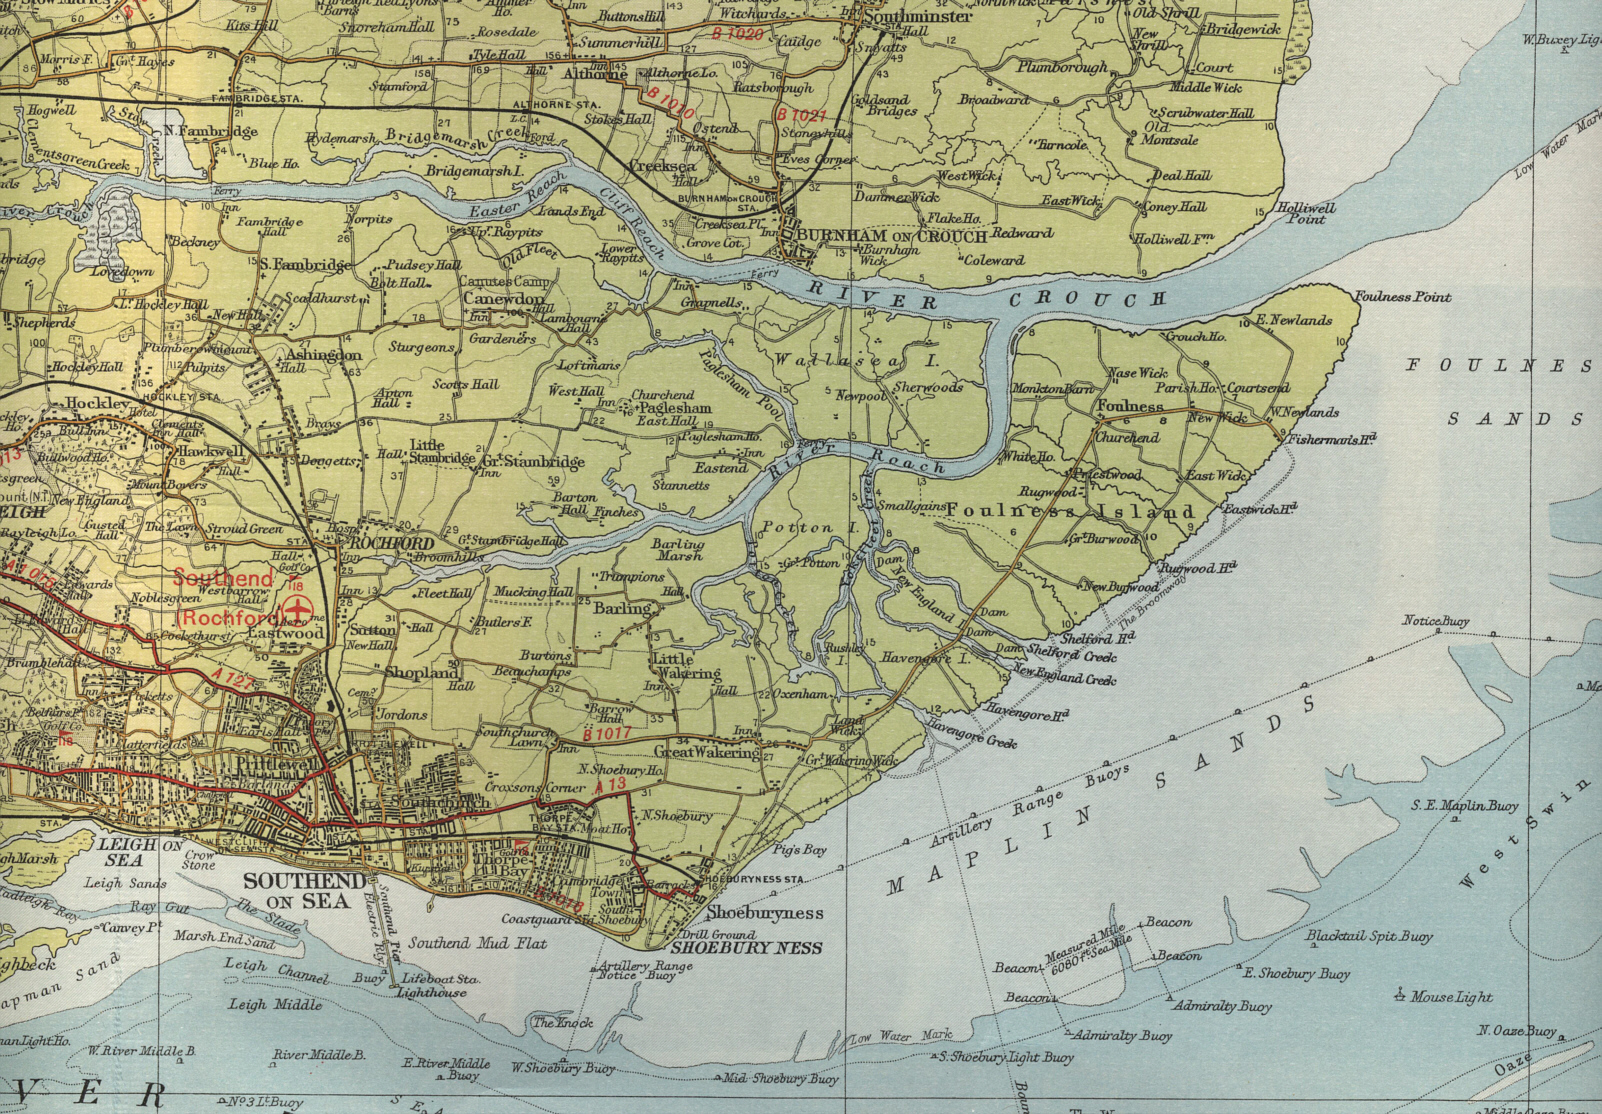 Reproduced from british-coast-maps.com